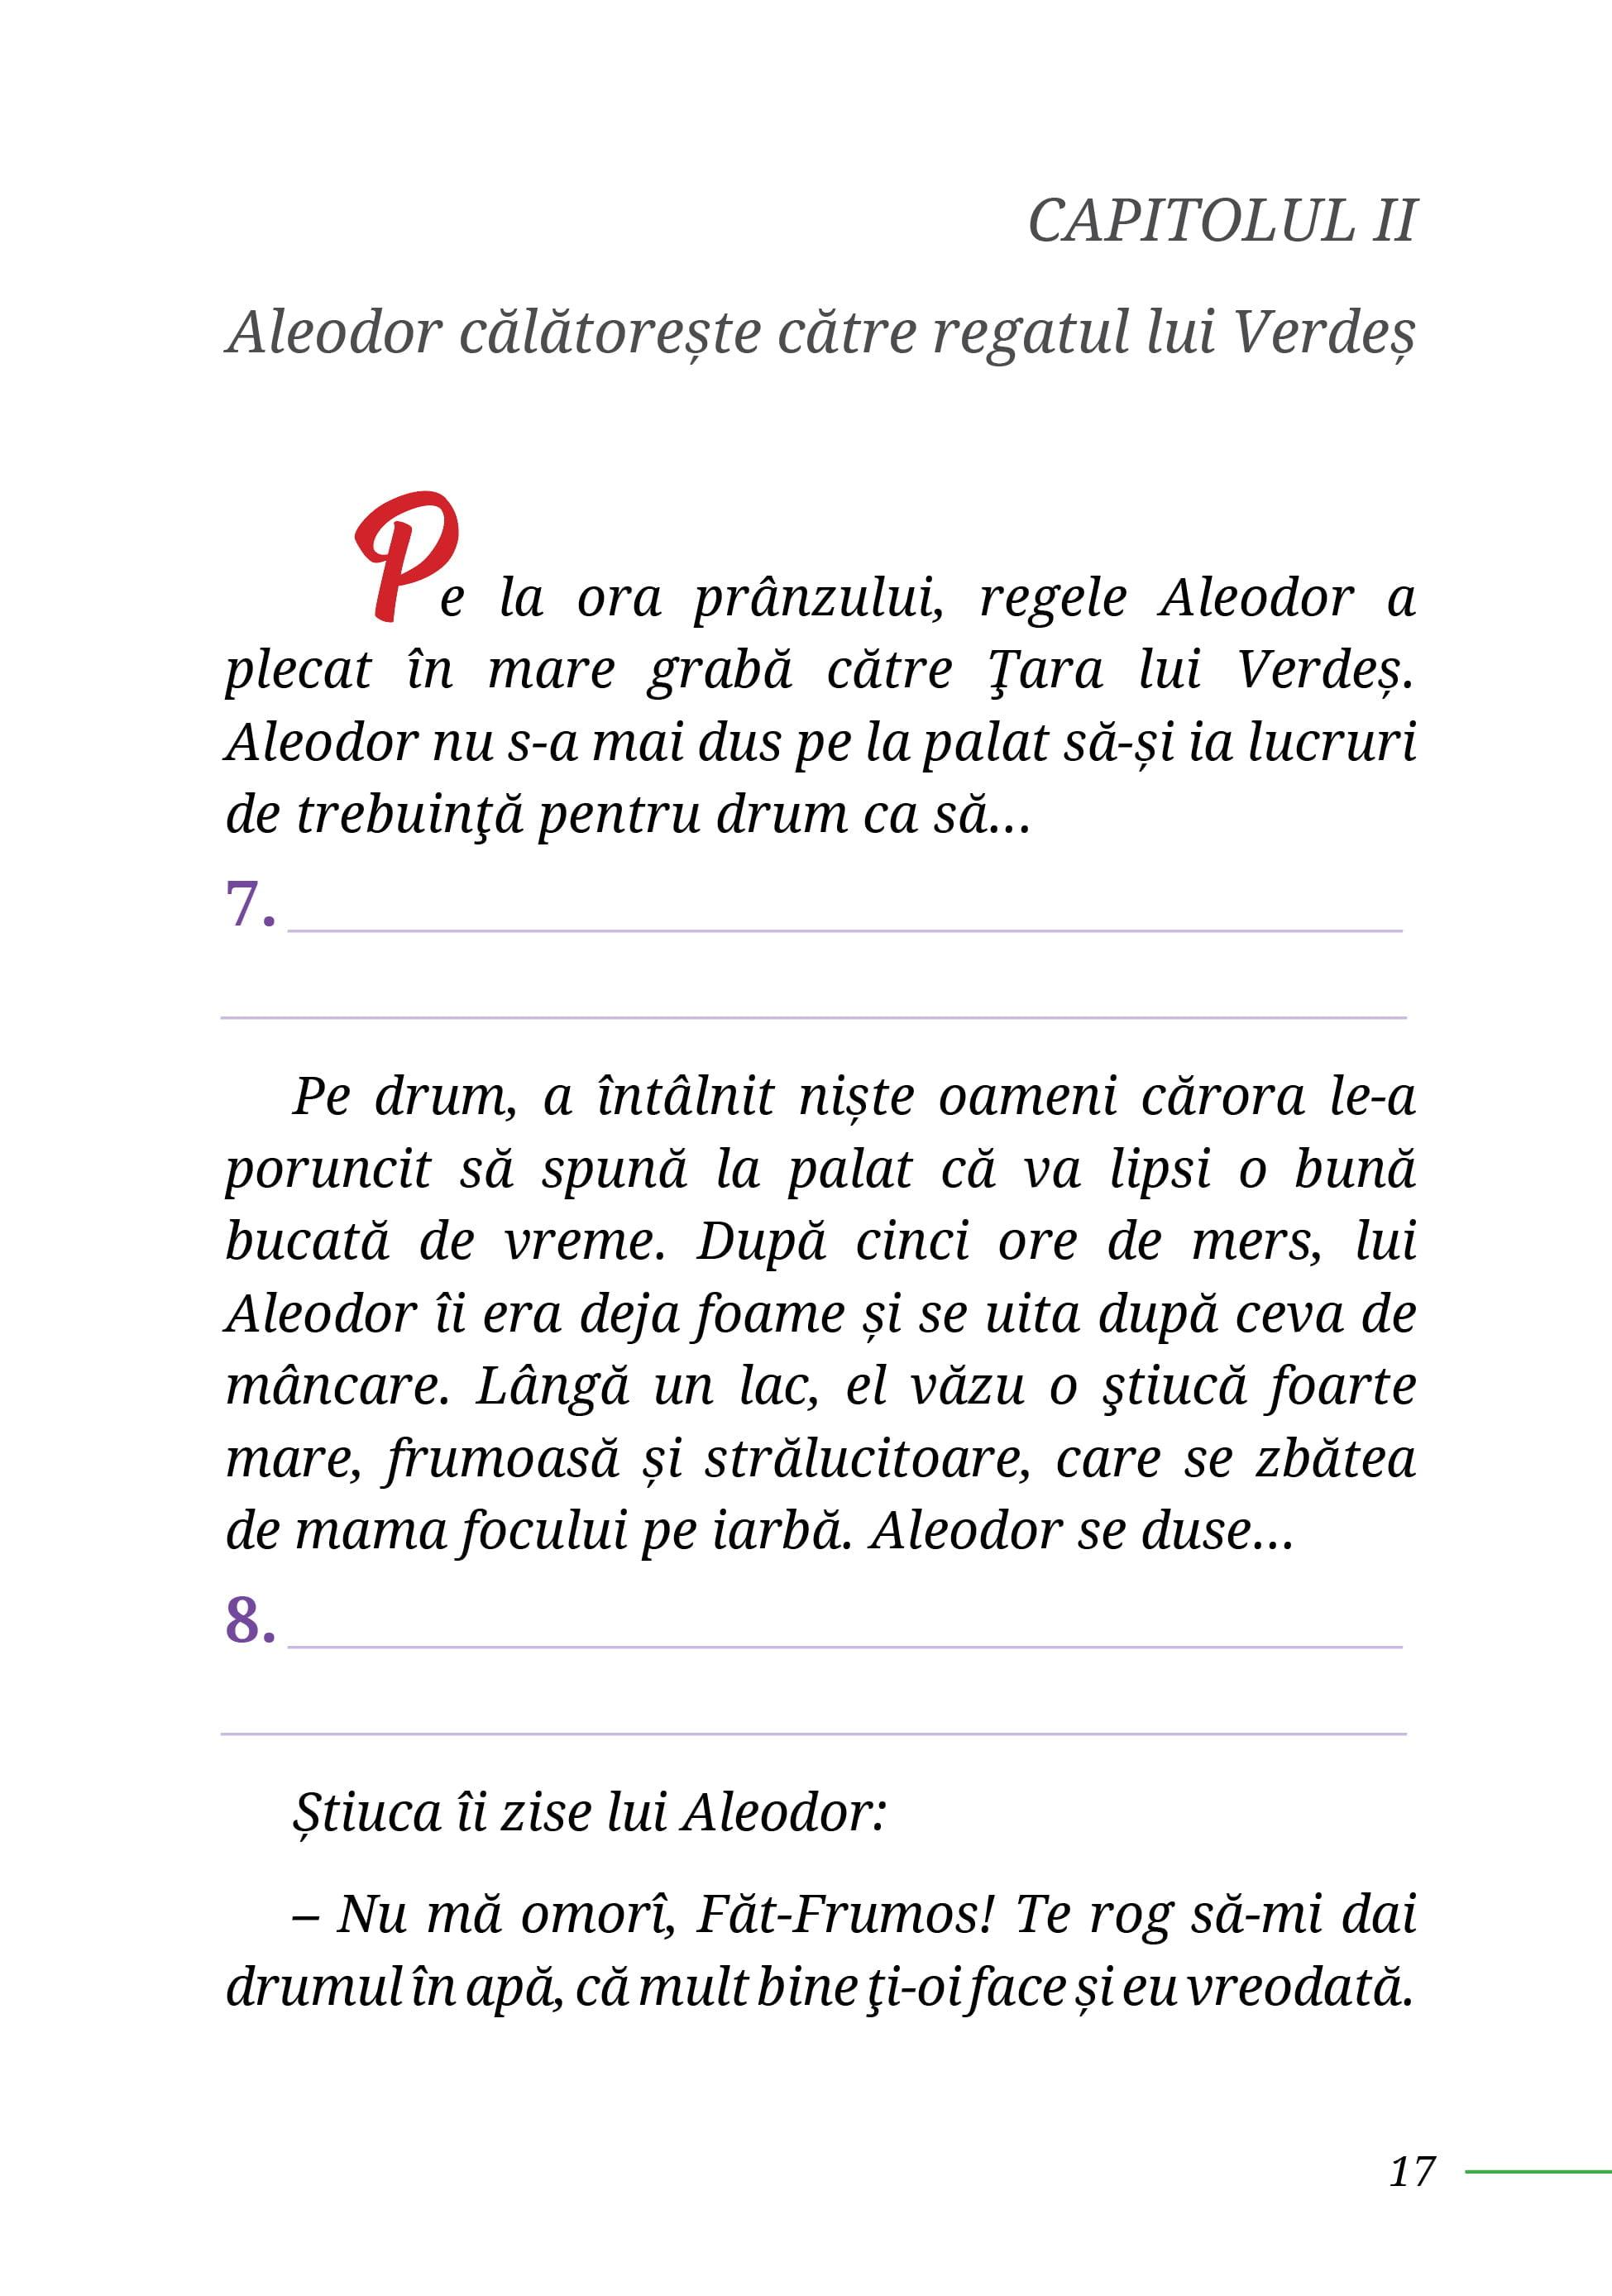 Aleodor pg 17